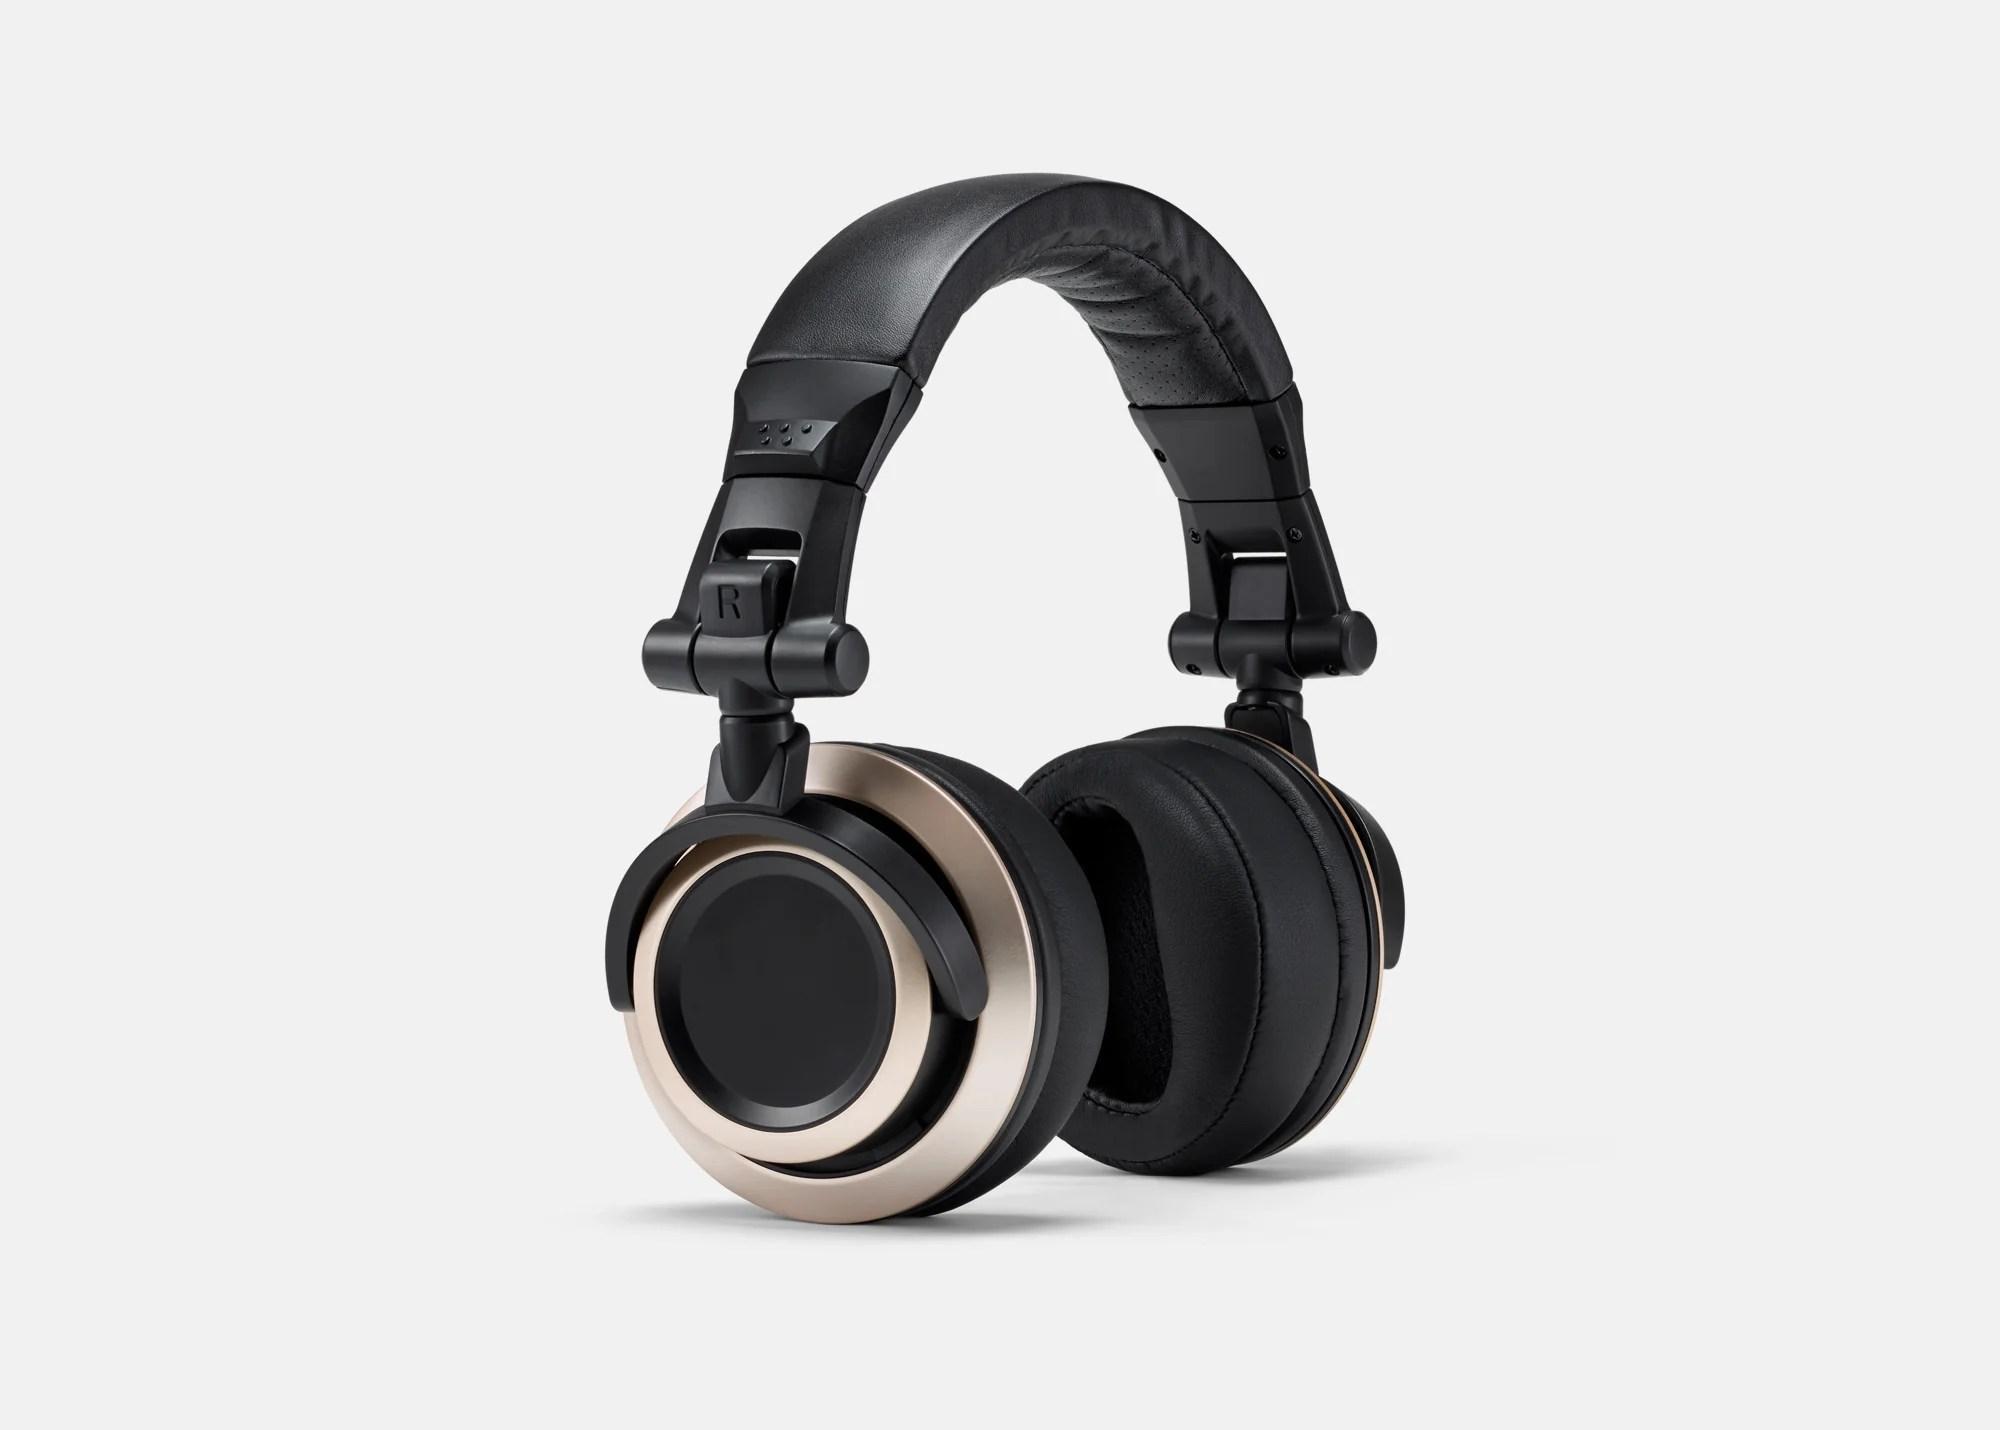 CB1 Studio Headphones by Status Audio